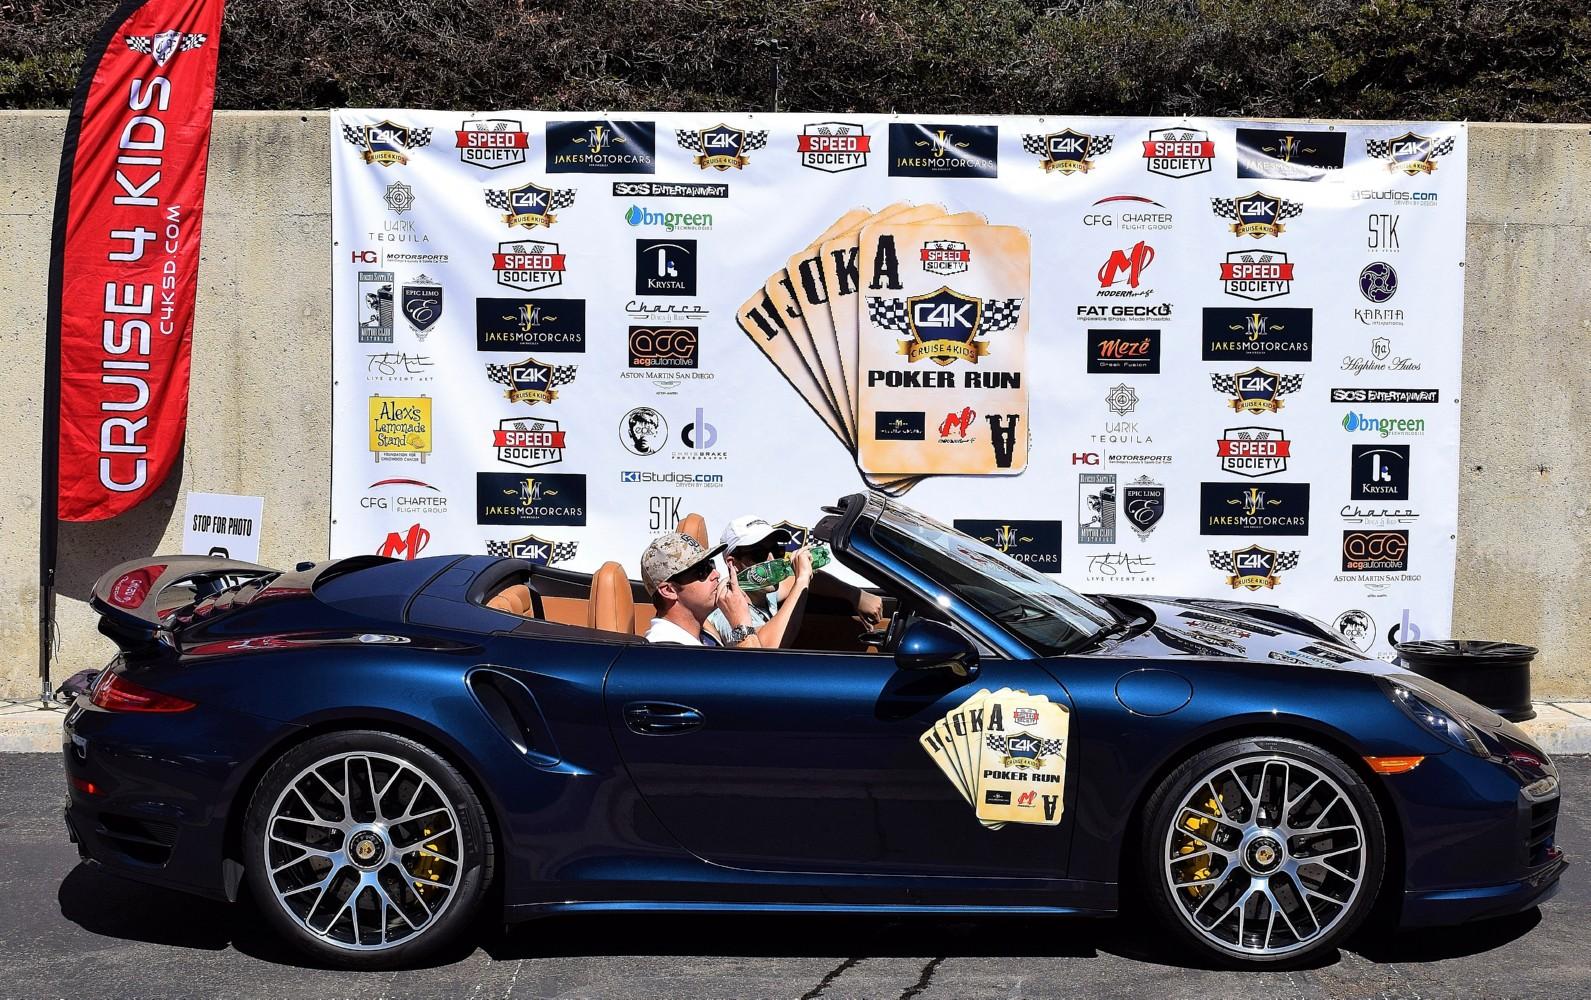 Poker Run 2017 Banner Photos - 2.jpg